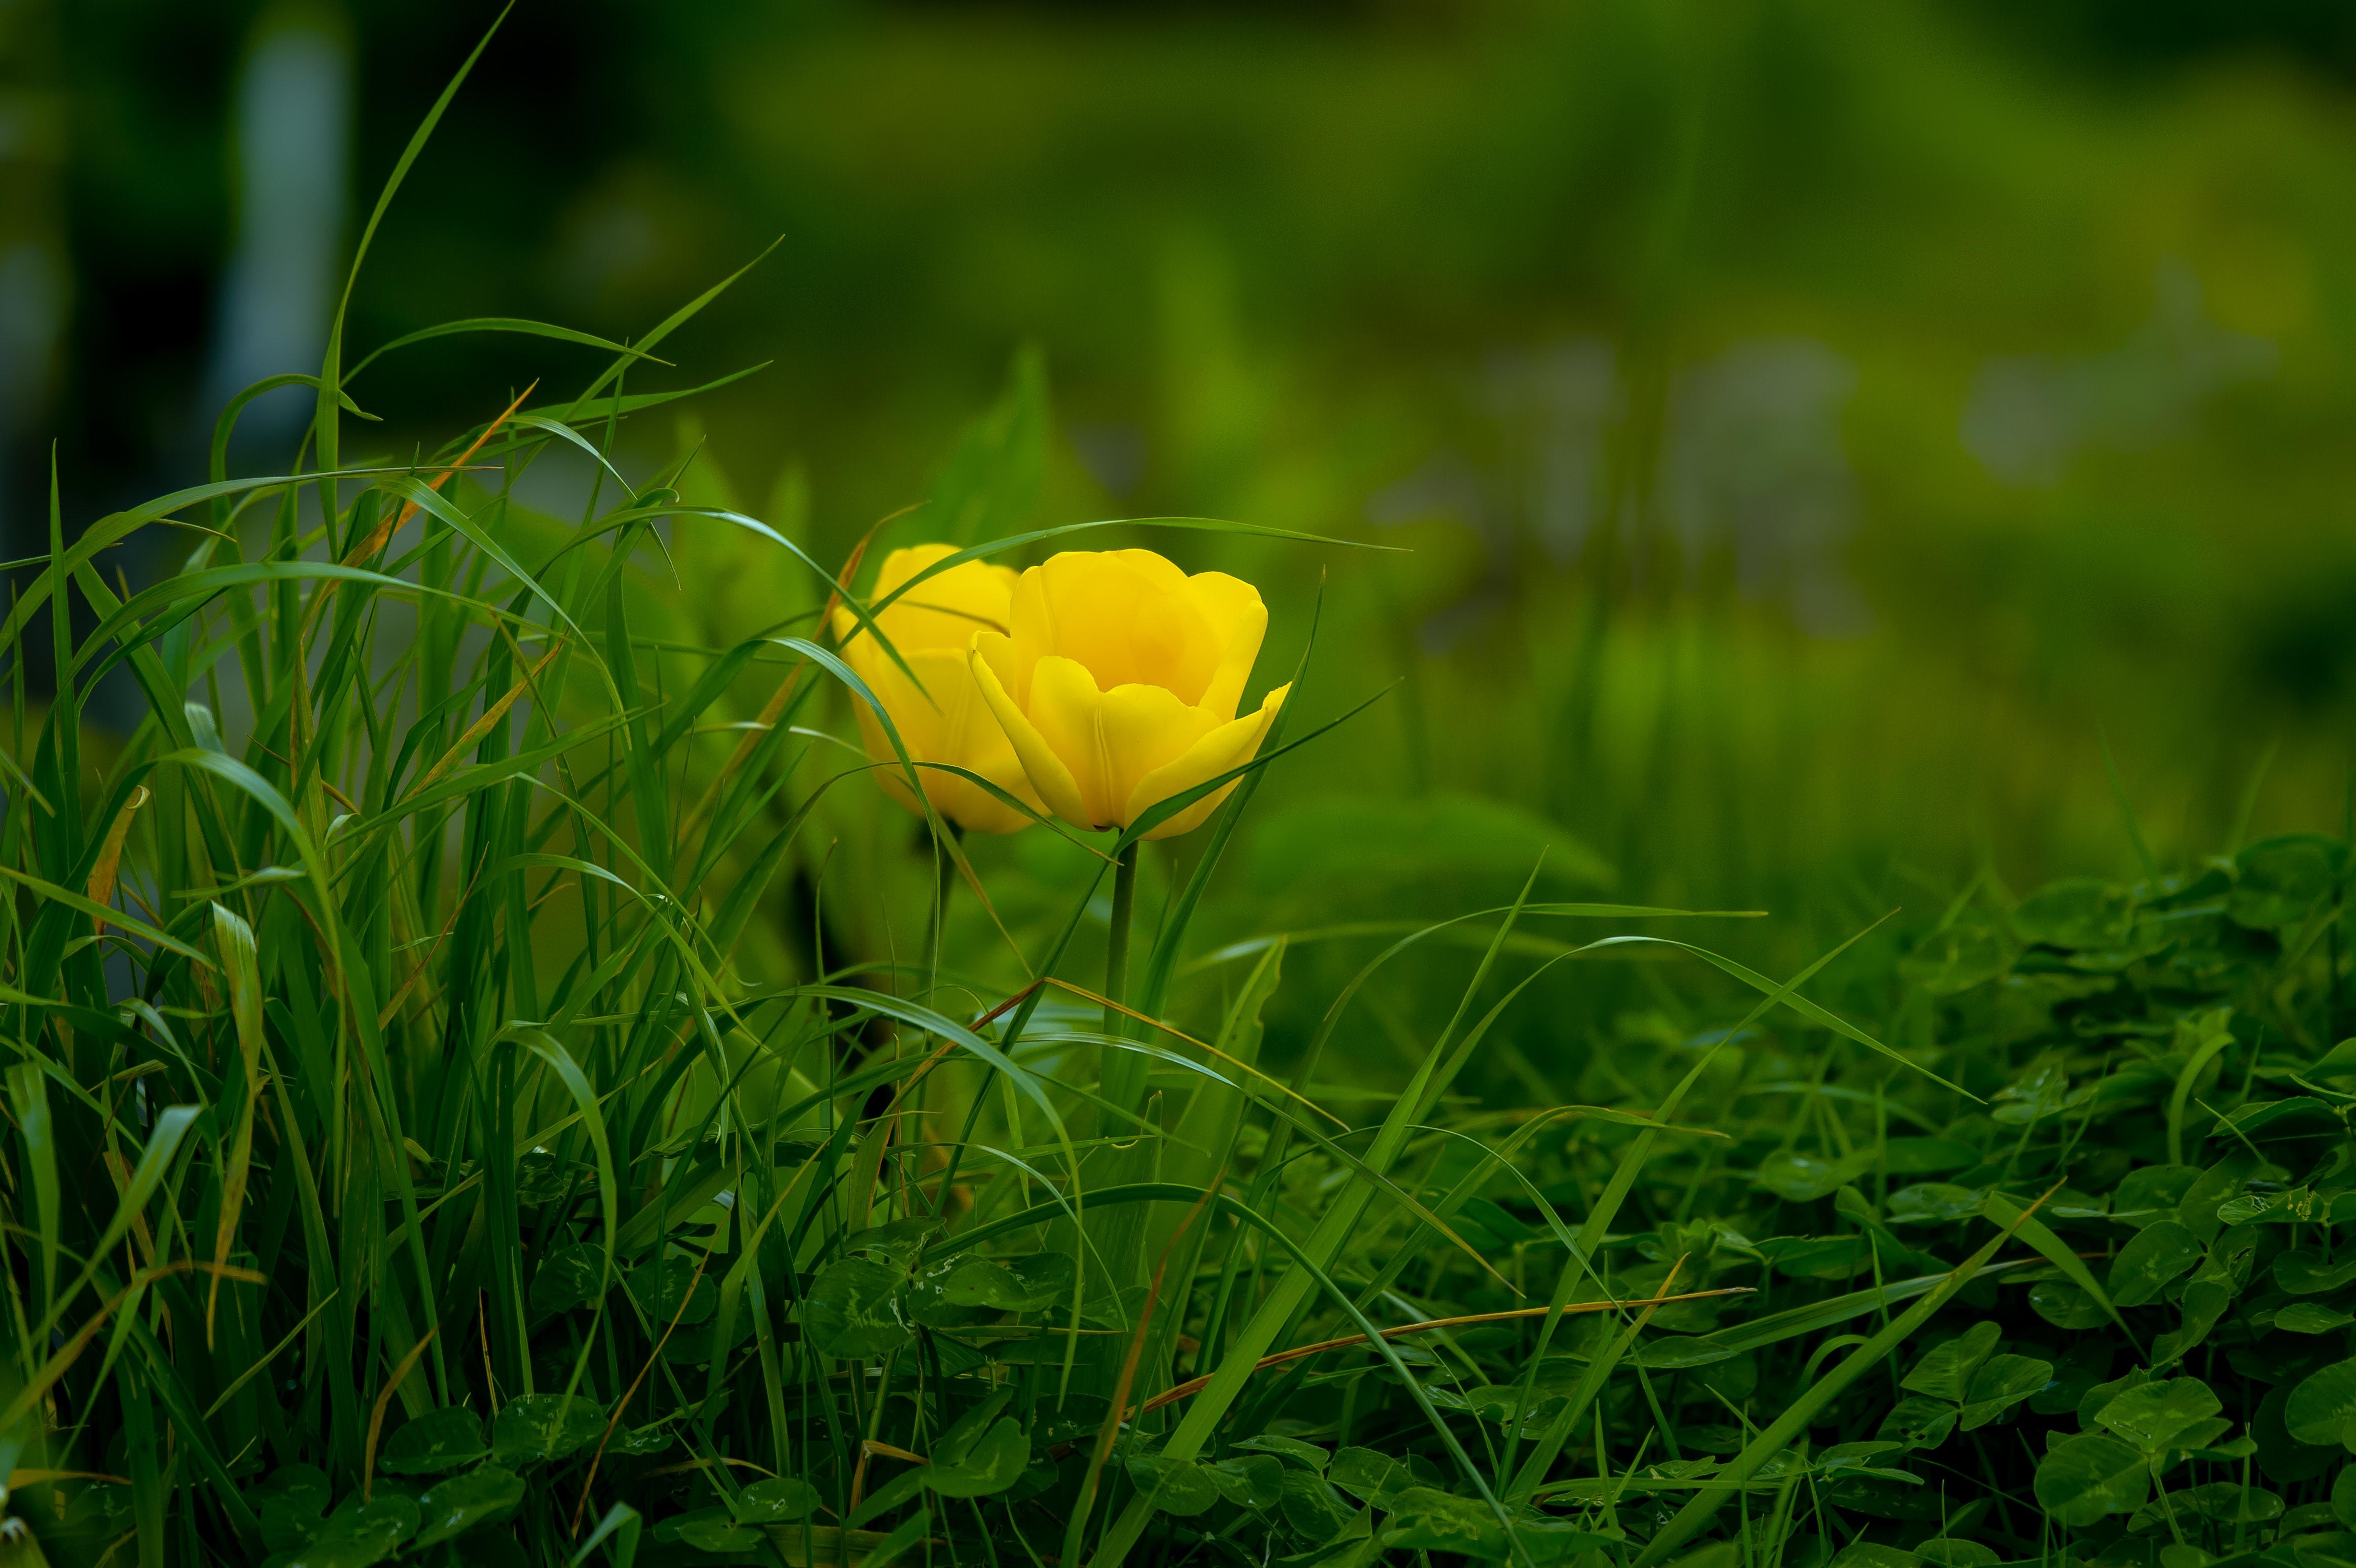 1000 Beautiful Single Flower Photos Pexels Free Stock: 1000+ Beautiful Hd Background Photos · Pexels · Free Stock